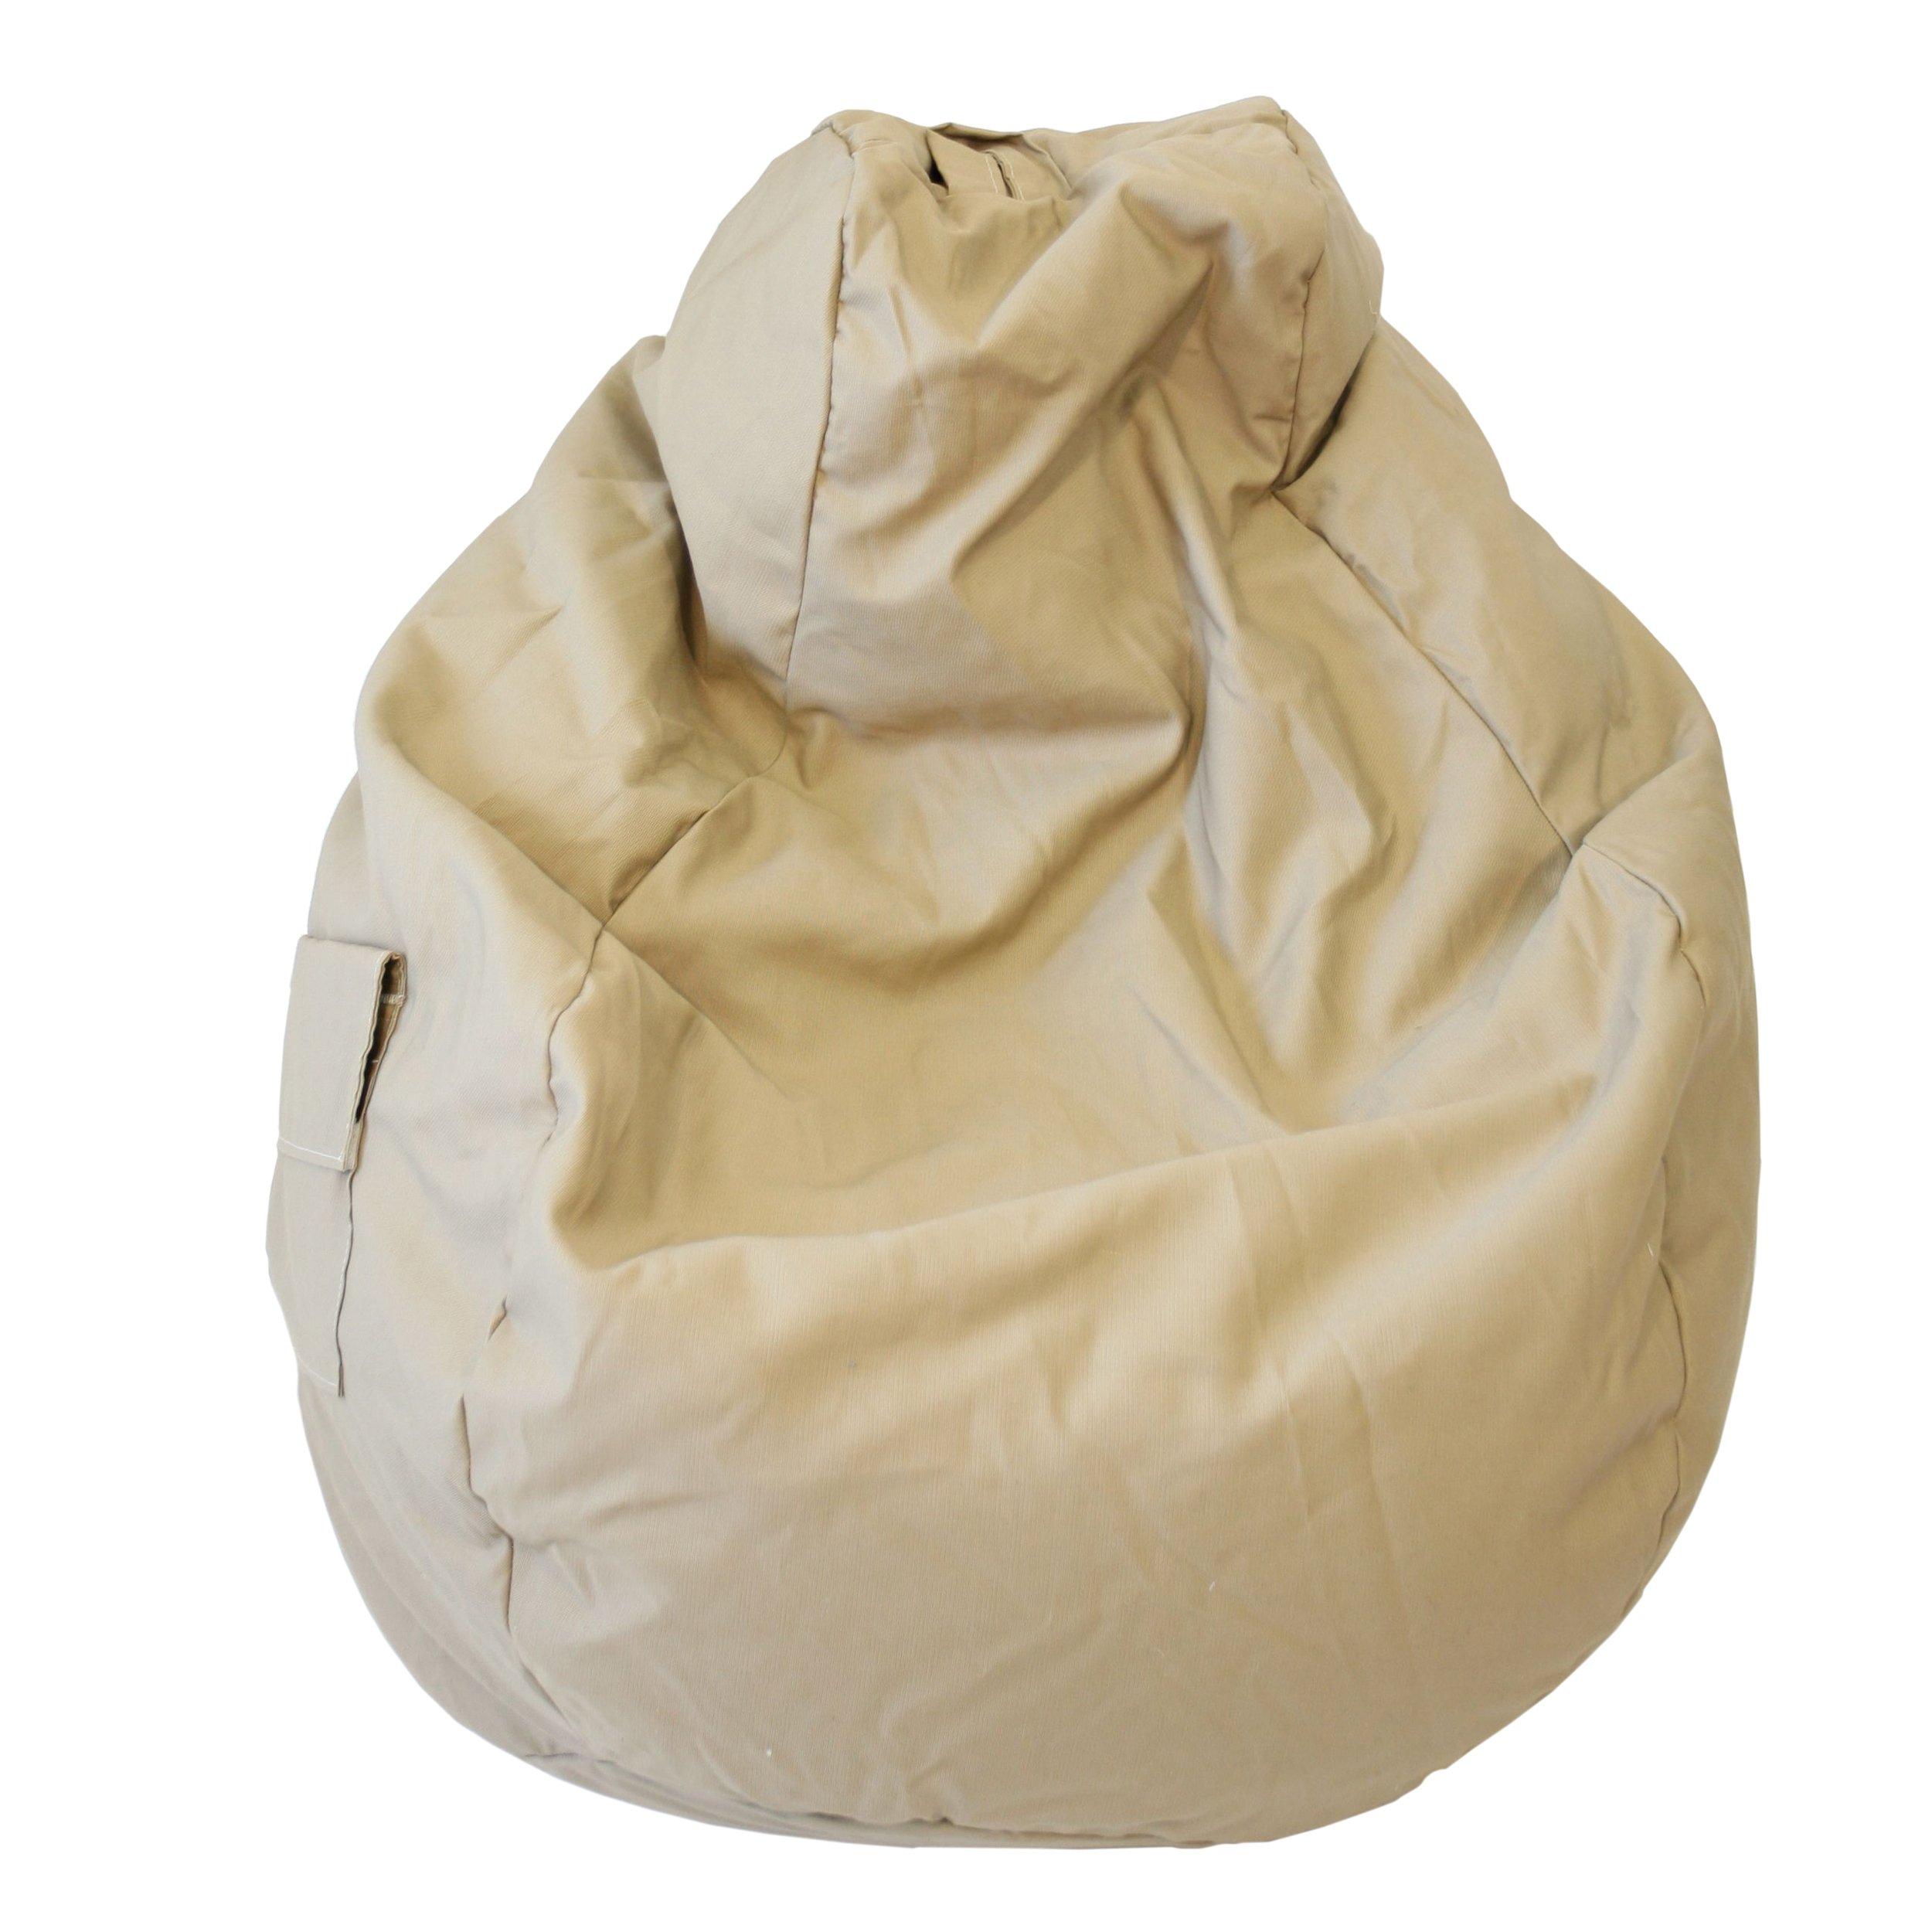 Gold Medal Bean Bags 31011284905TD Large Denim Tear Drop Bean Bag with Pocket, Khaki